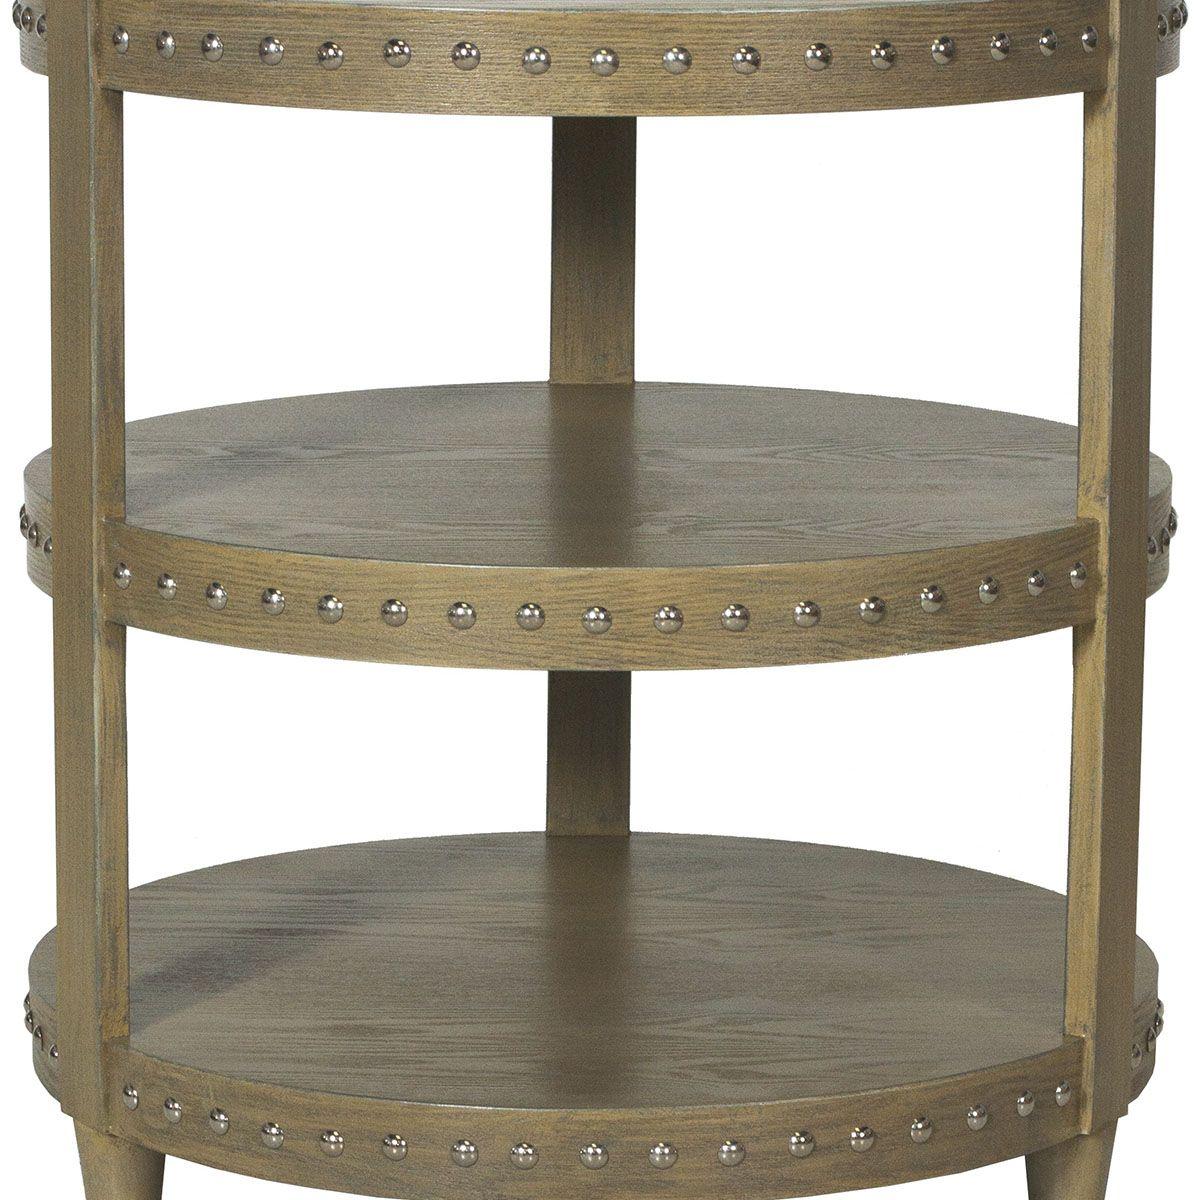 Worlds Away Tier Limed Oak Veneer Nickel Studded Side Table NORA - Studded coffee table